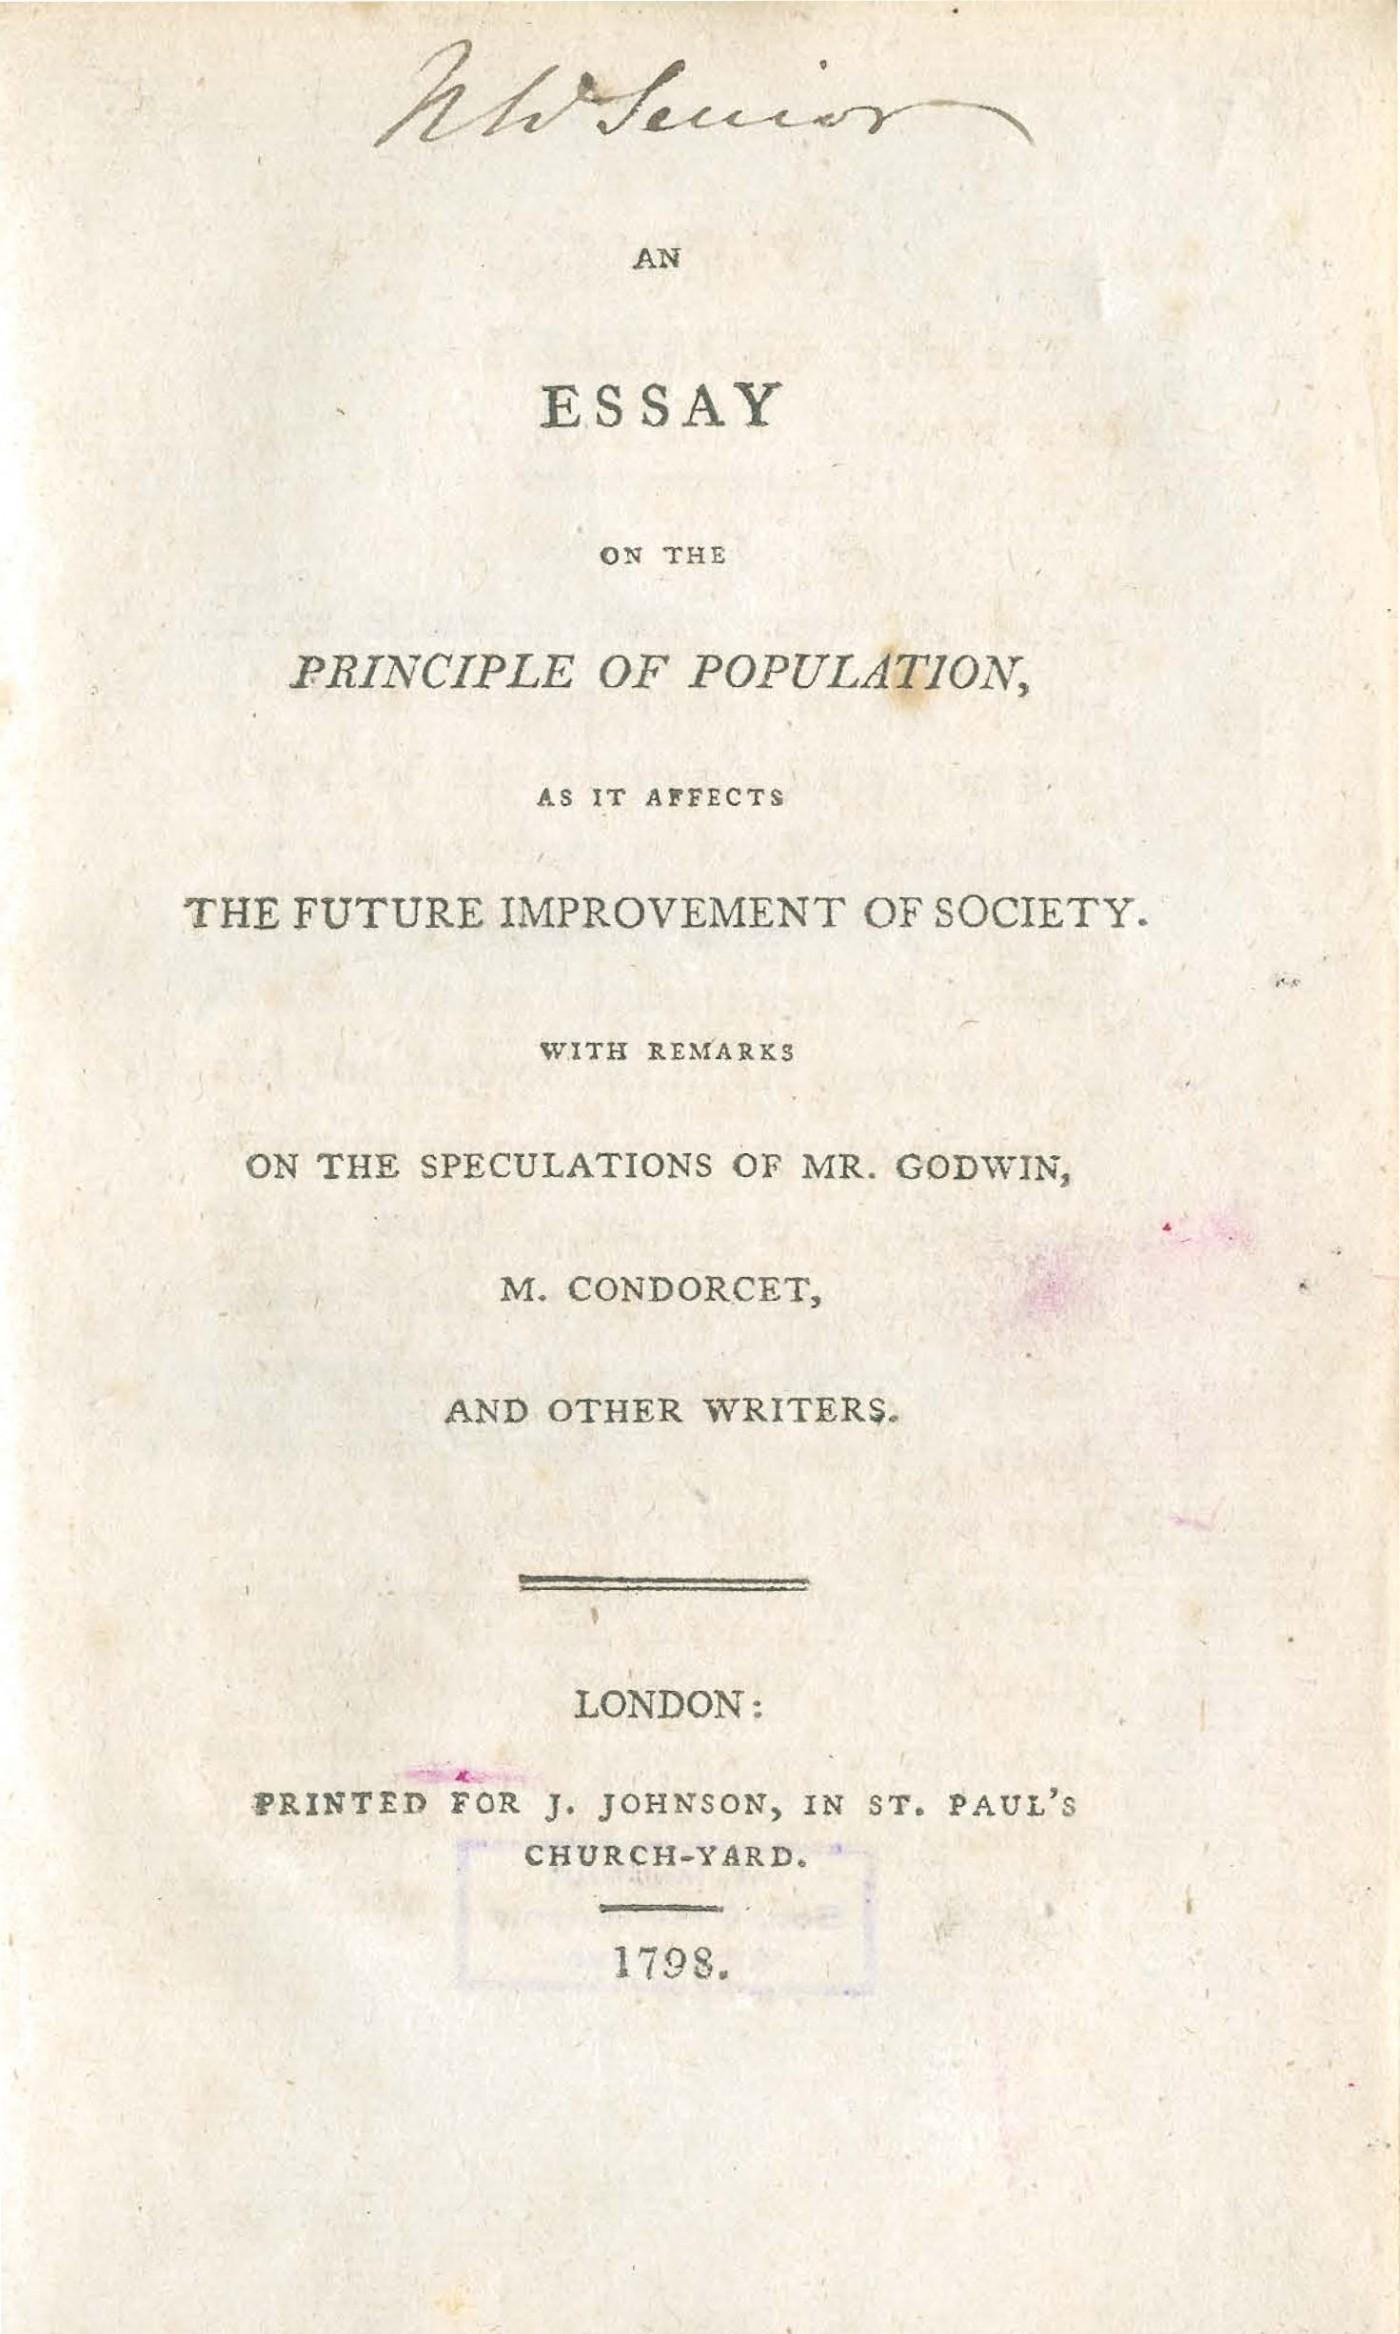 001 Essay On The Principle Of Population Singular Malthus Sparknotes Thomas Main Idea 1400